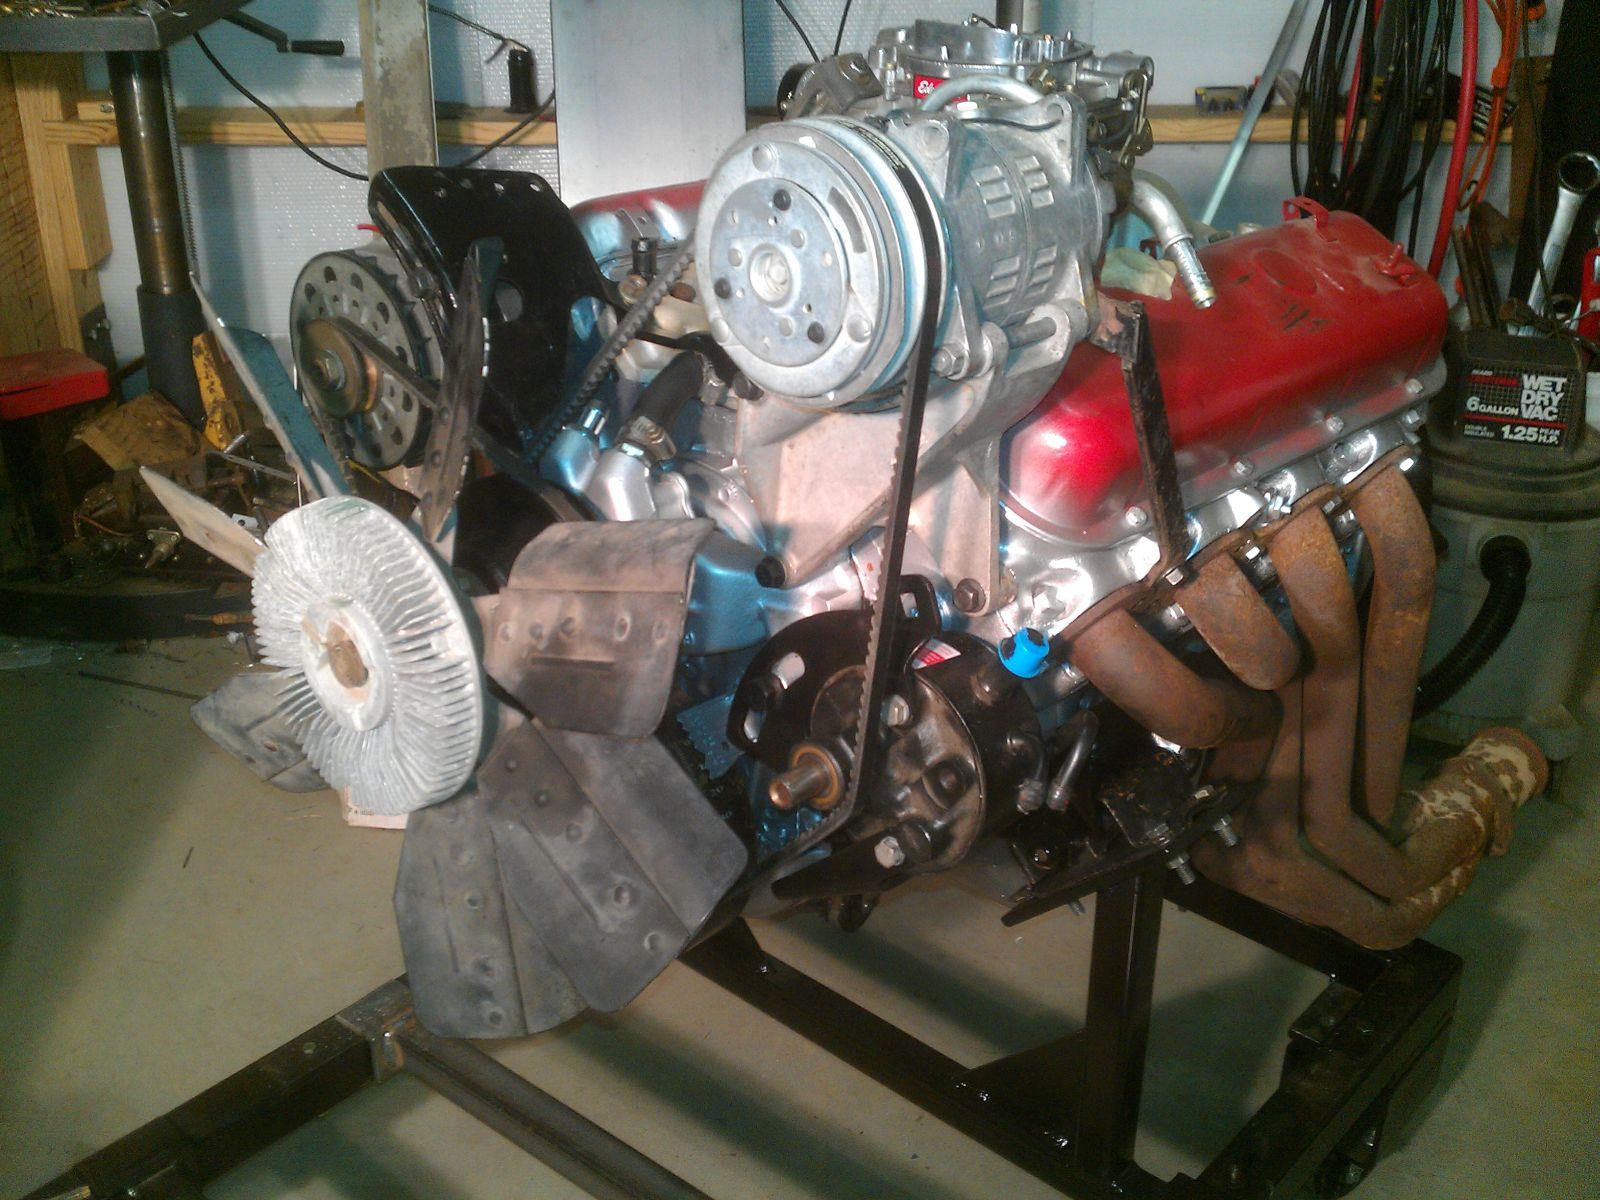 Click image for larger version  Name:74-argosy-engine-side-ac-alt-1.jpg Views:82 Size:324.5 KB ID:178179